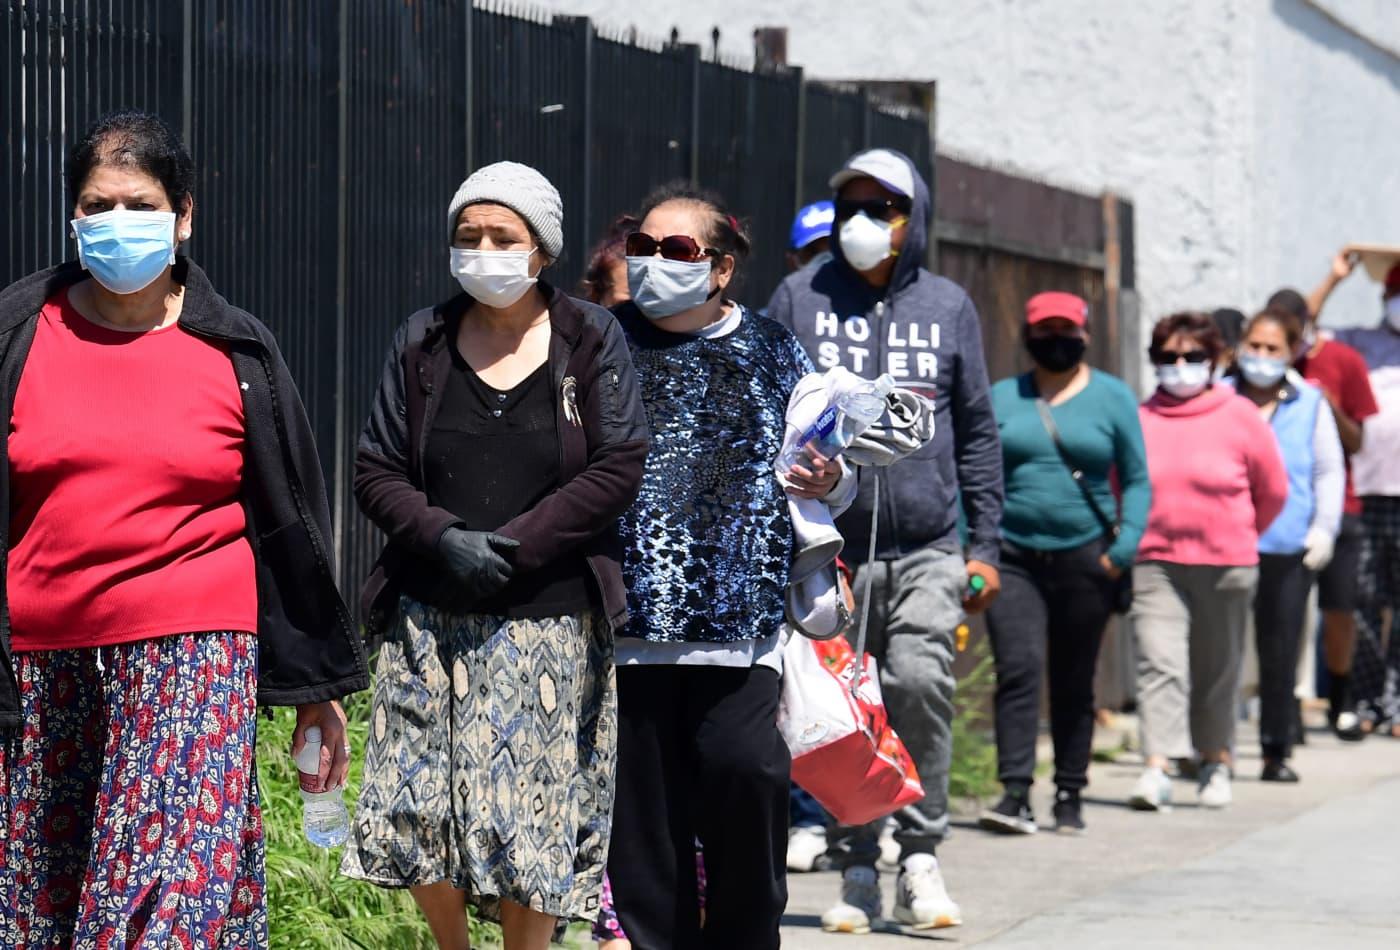 Trade tensions are a bigger risk to stocks than coronavirus, Invesco's Kristina Hooper warns